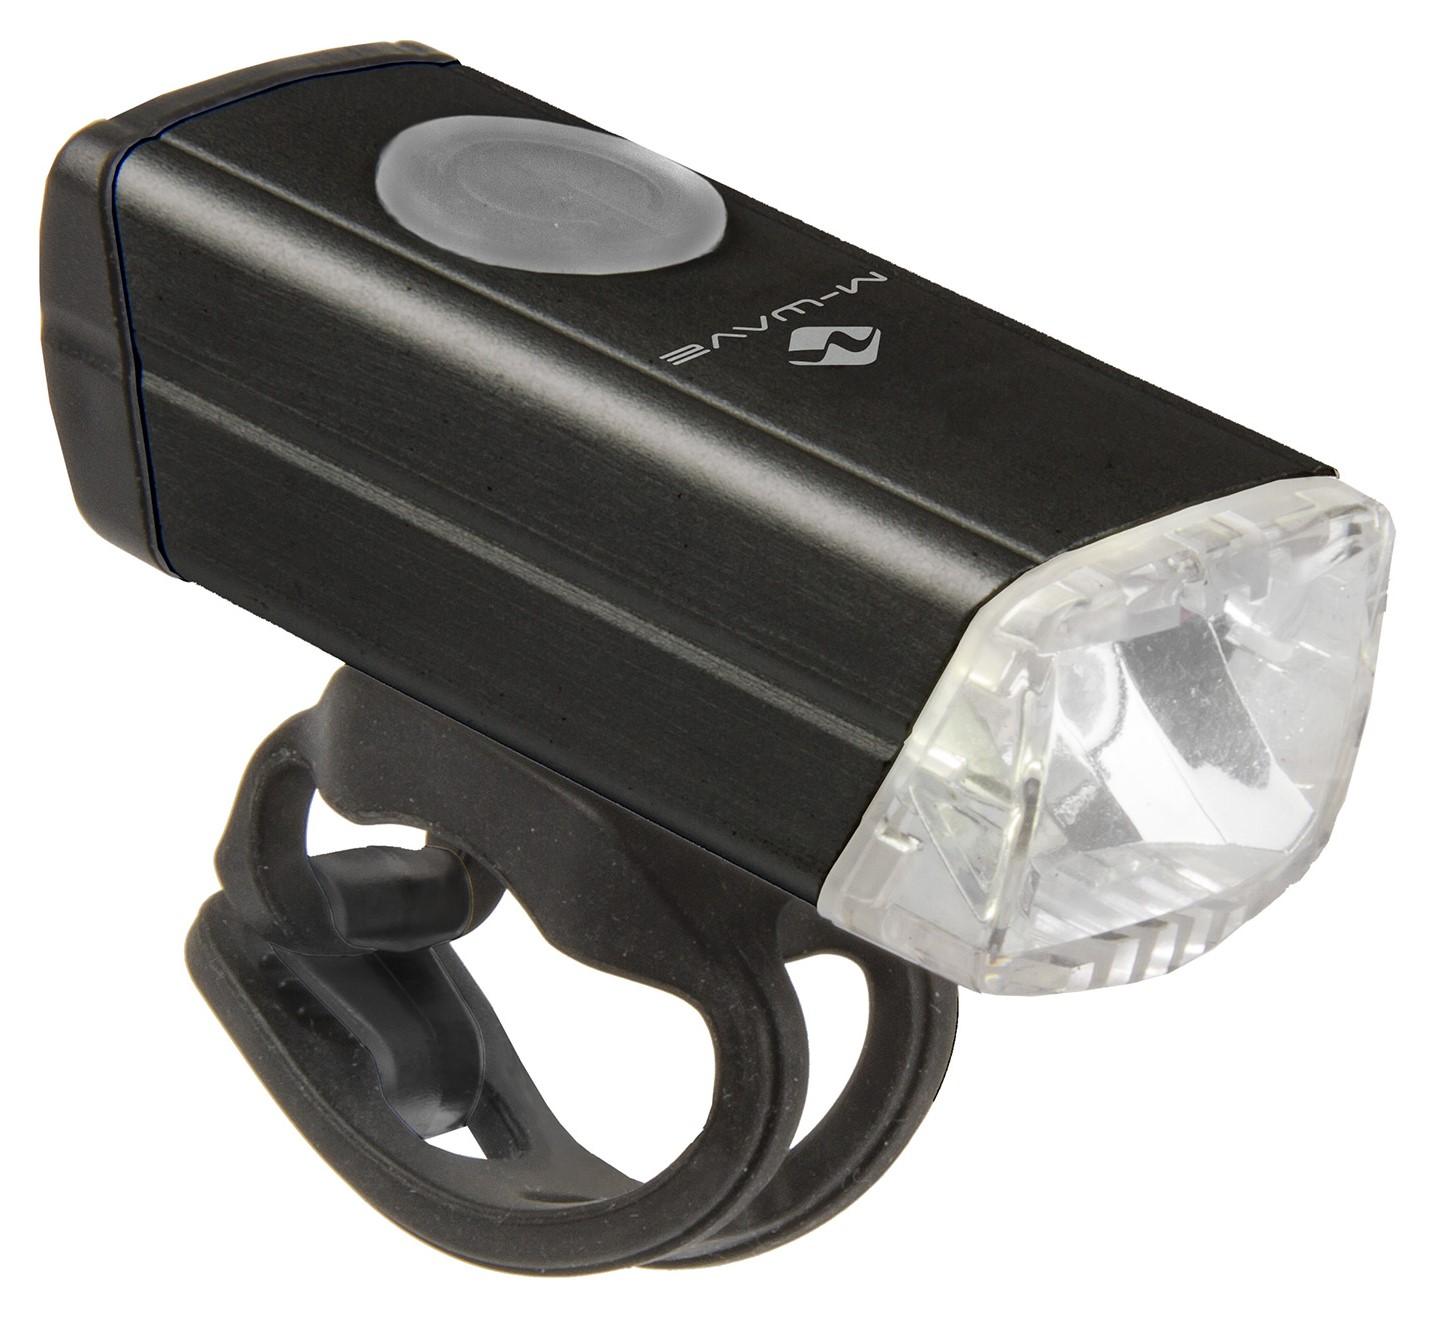 luČ m-wave apollon 20 usb accumulator lamp